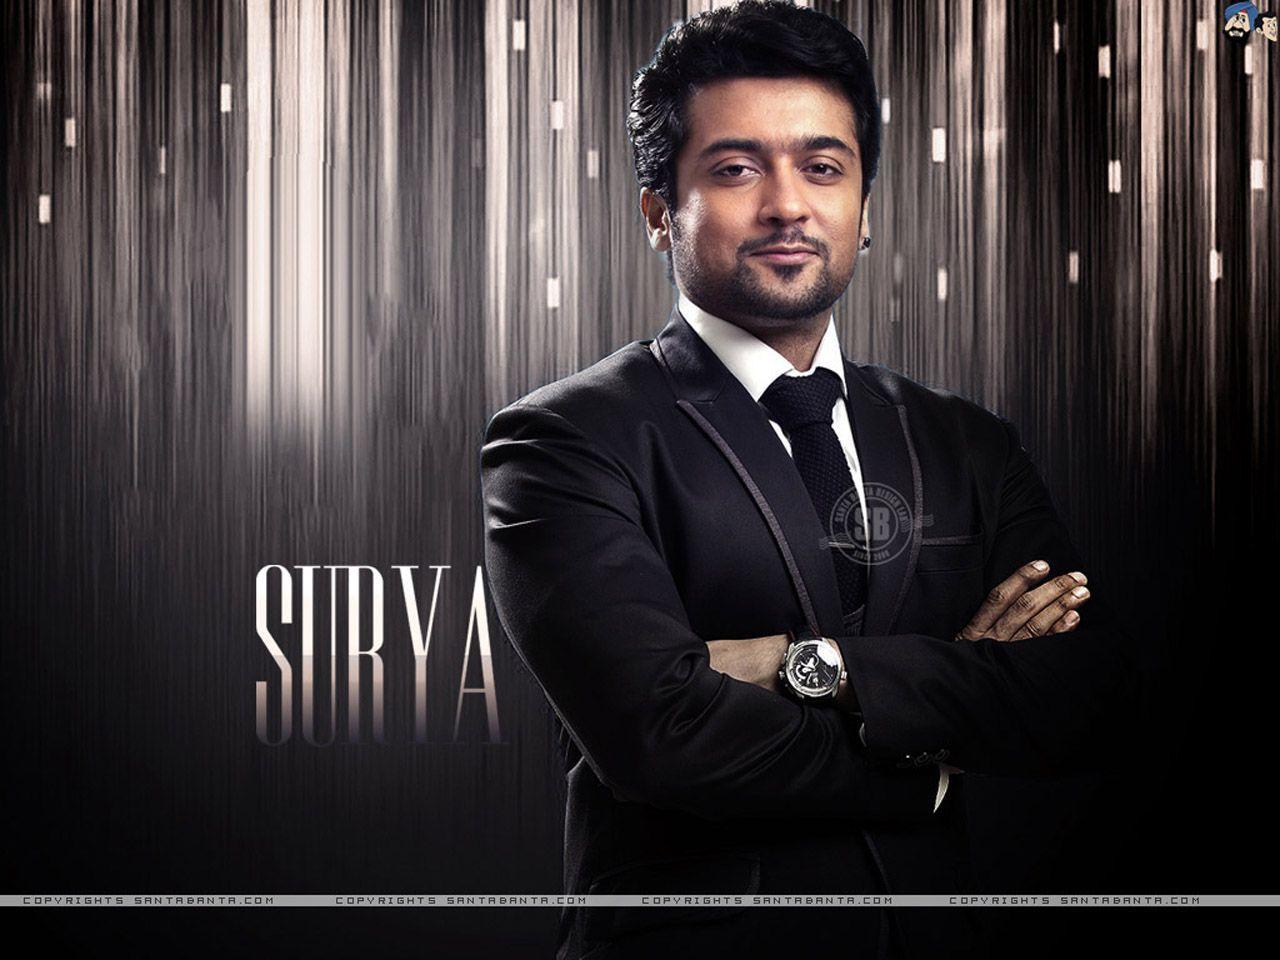 Suriya Movie Stills Photos Wallpapers: Surya HD Wallpapers 2016